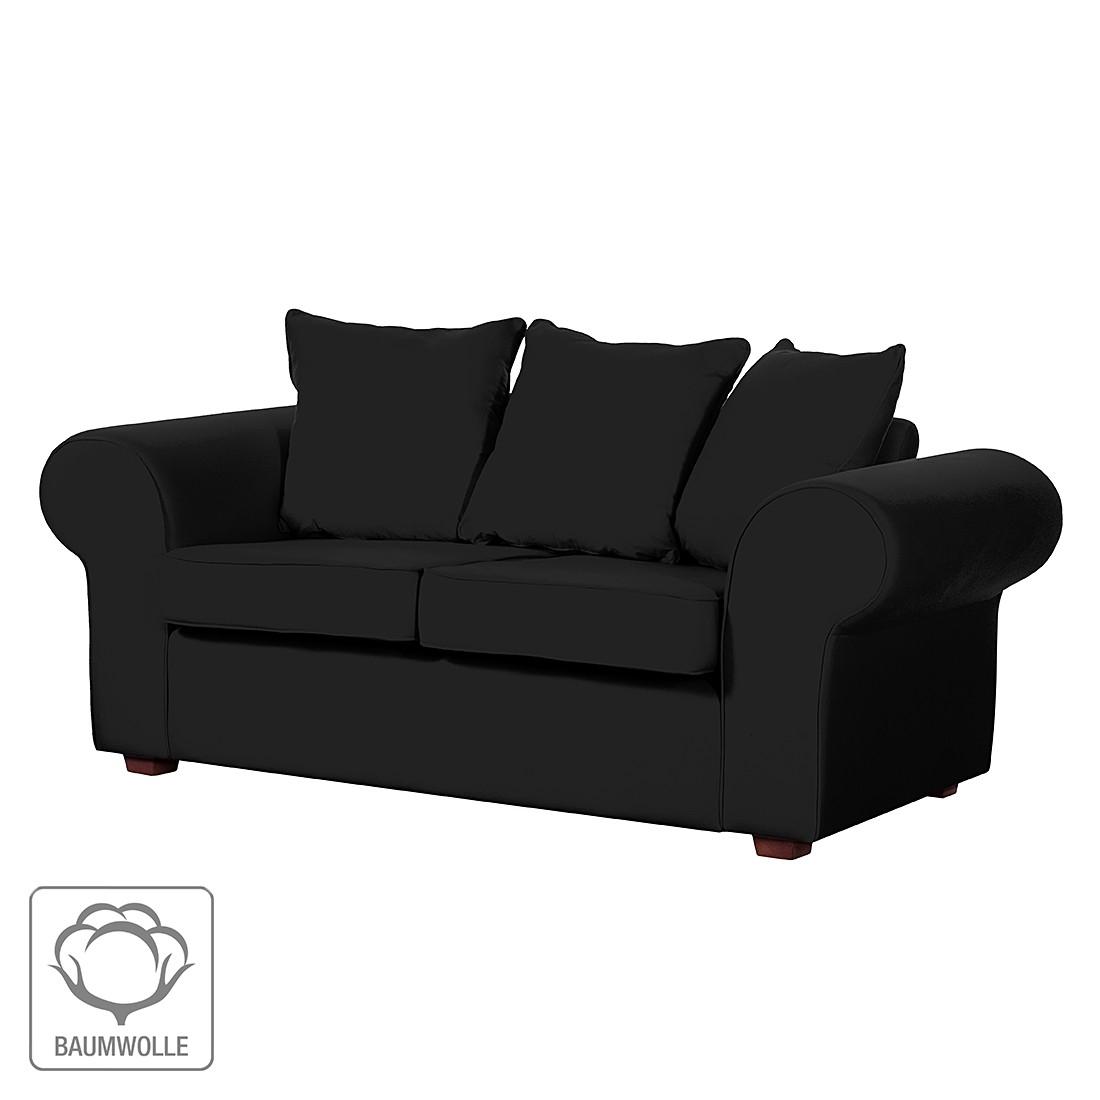 Sofa Colmar (2-Sitzer) – Baumwollstoff Schwarz, Jack & Alice kaufen